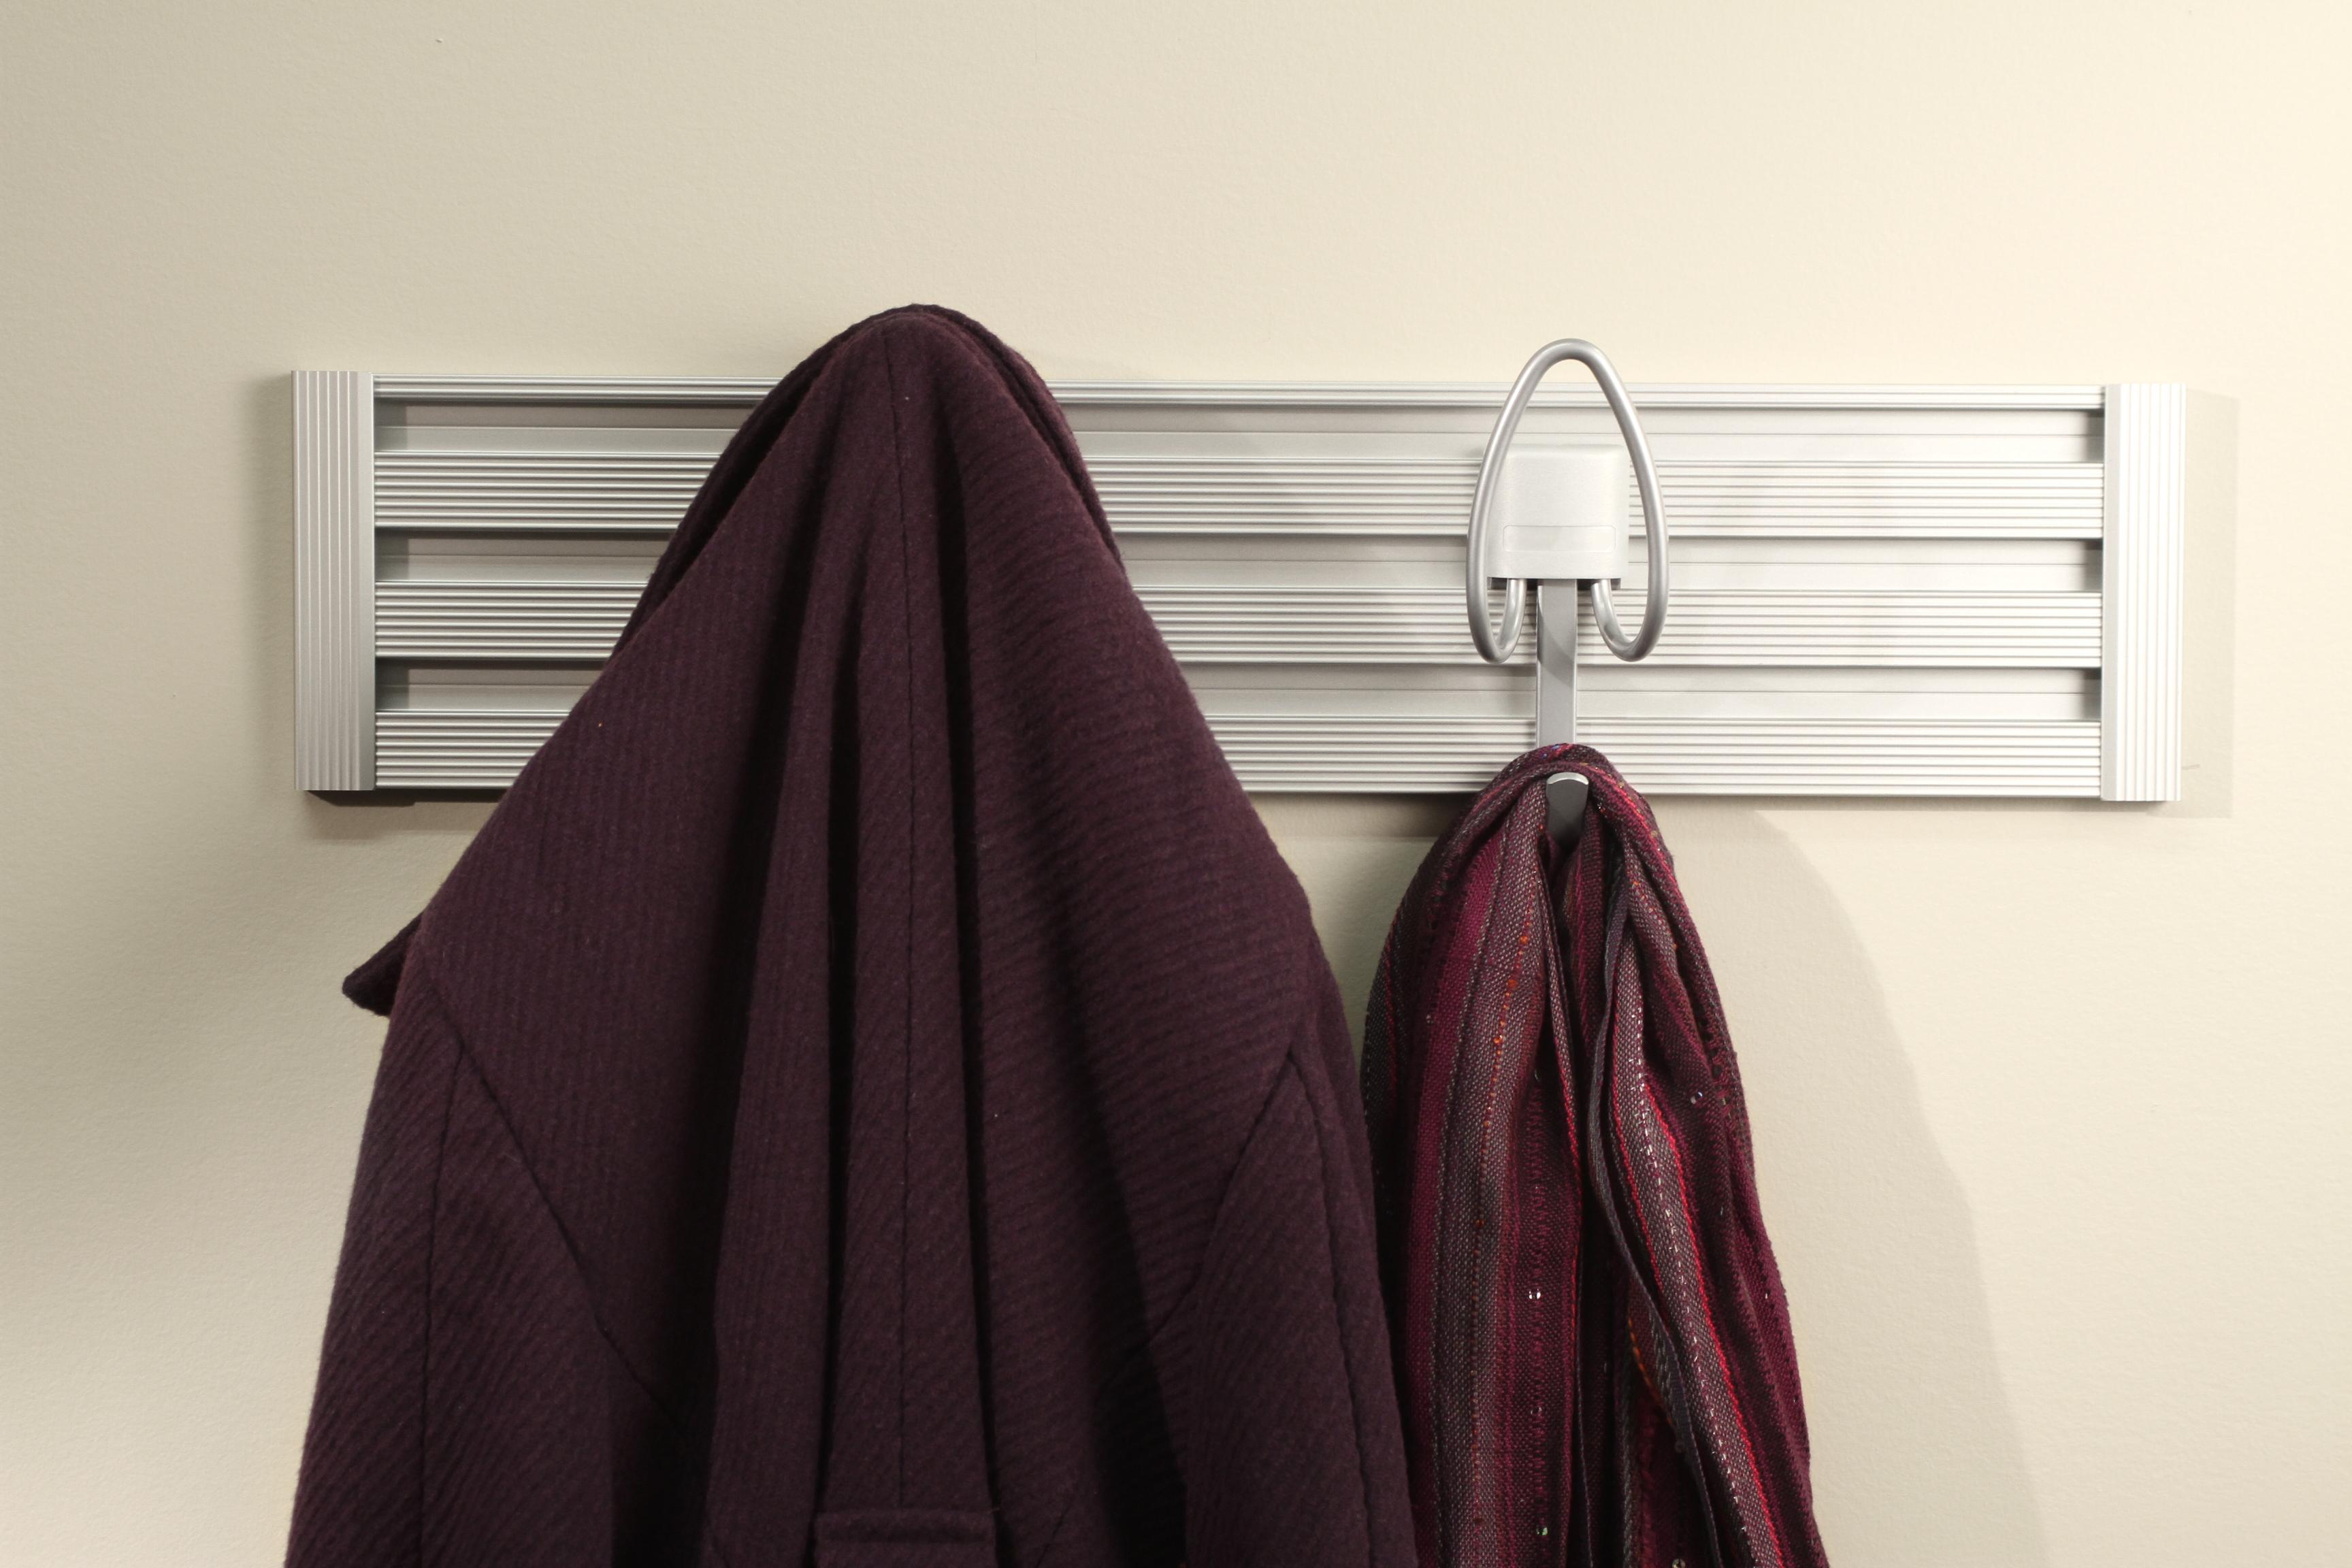 TRACK WALL_Closet_Coat-Hook_img3